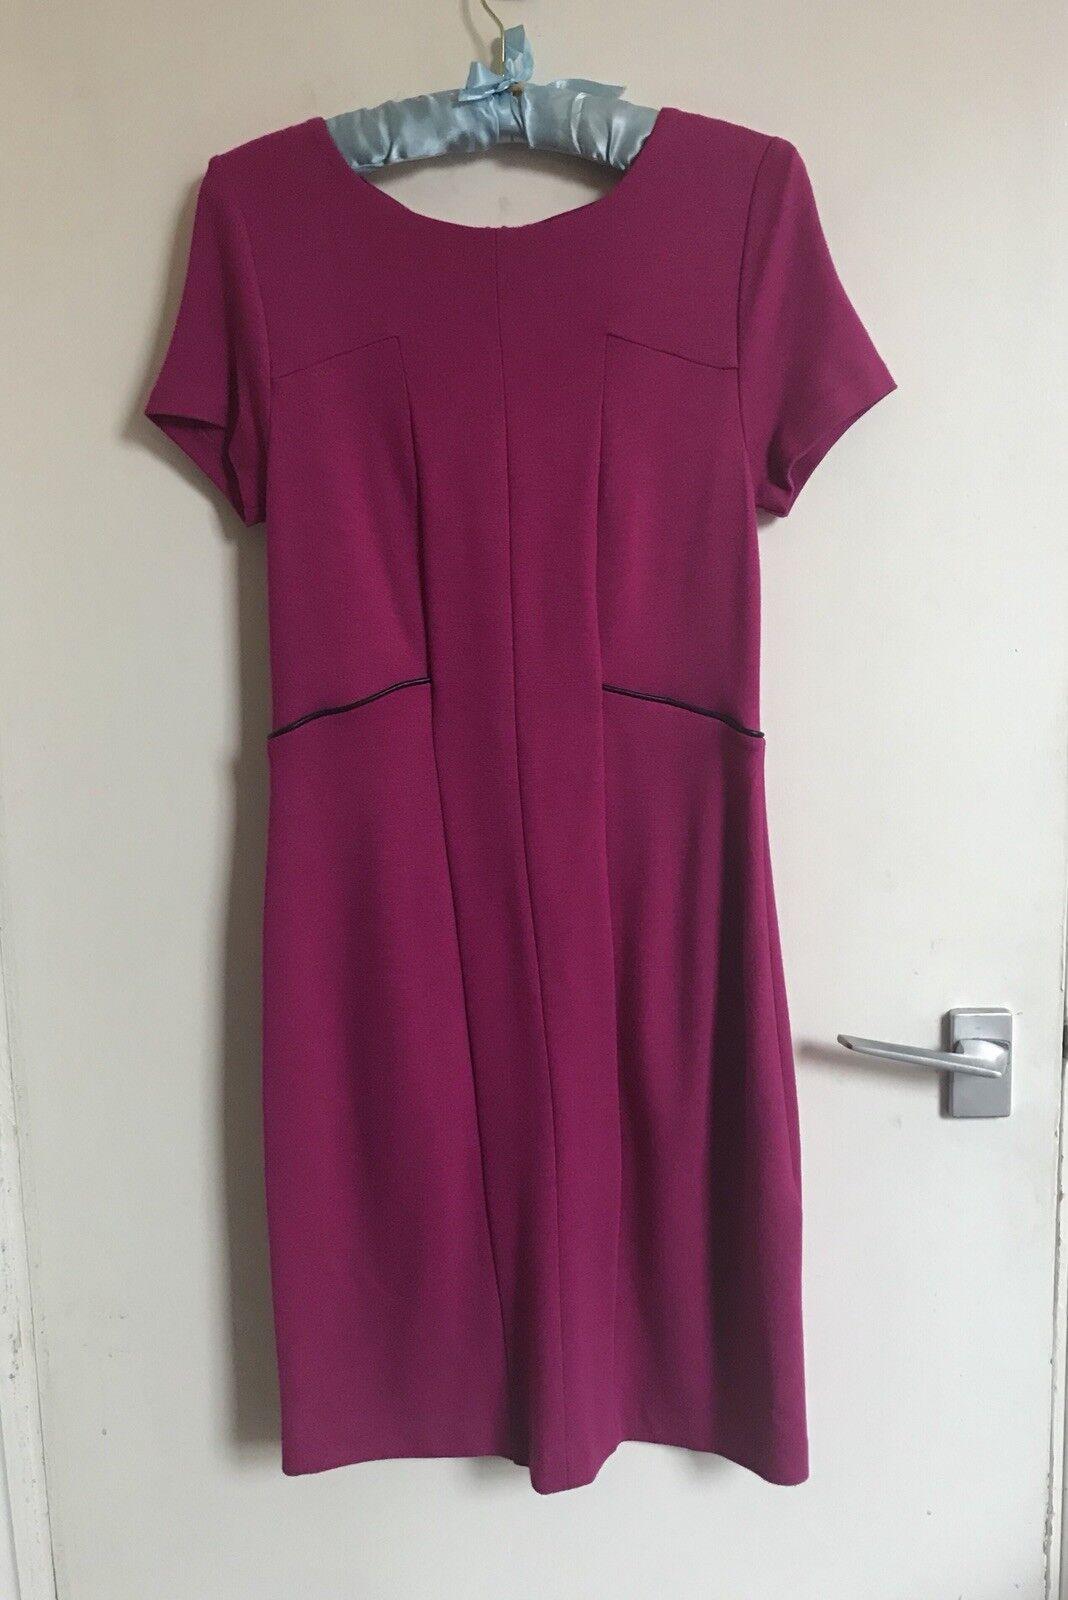 Coast Polyana Dress Size 8 New